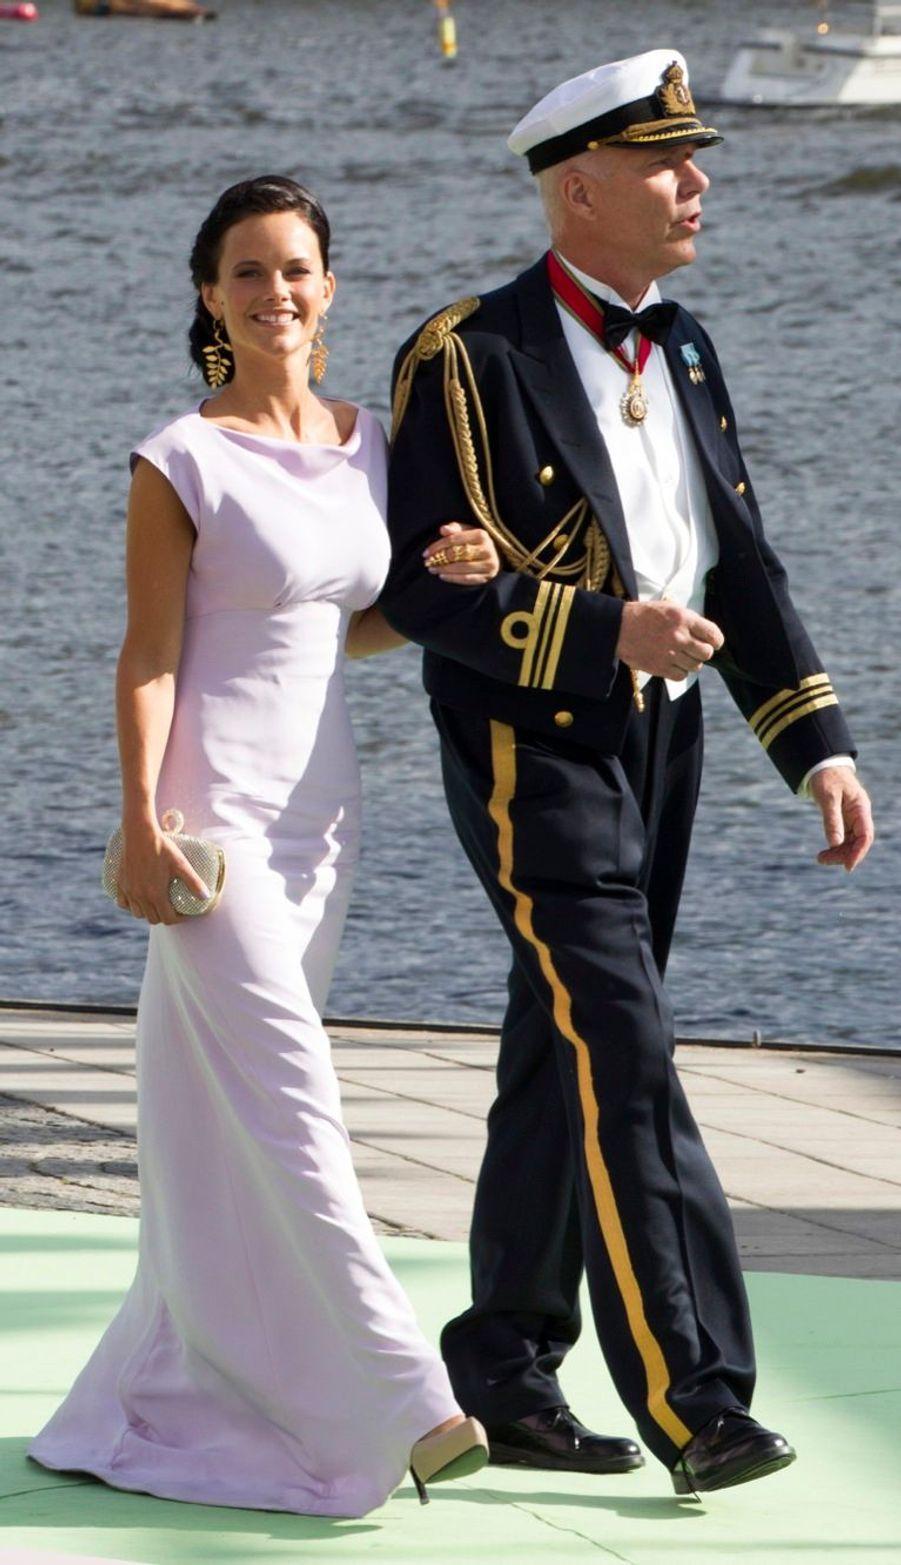 Sofia au mariage de la princesse Madeleine en juin 2013